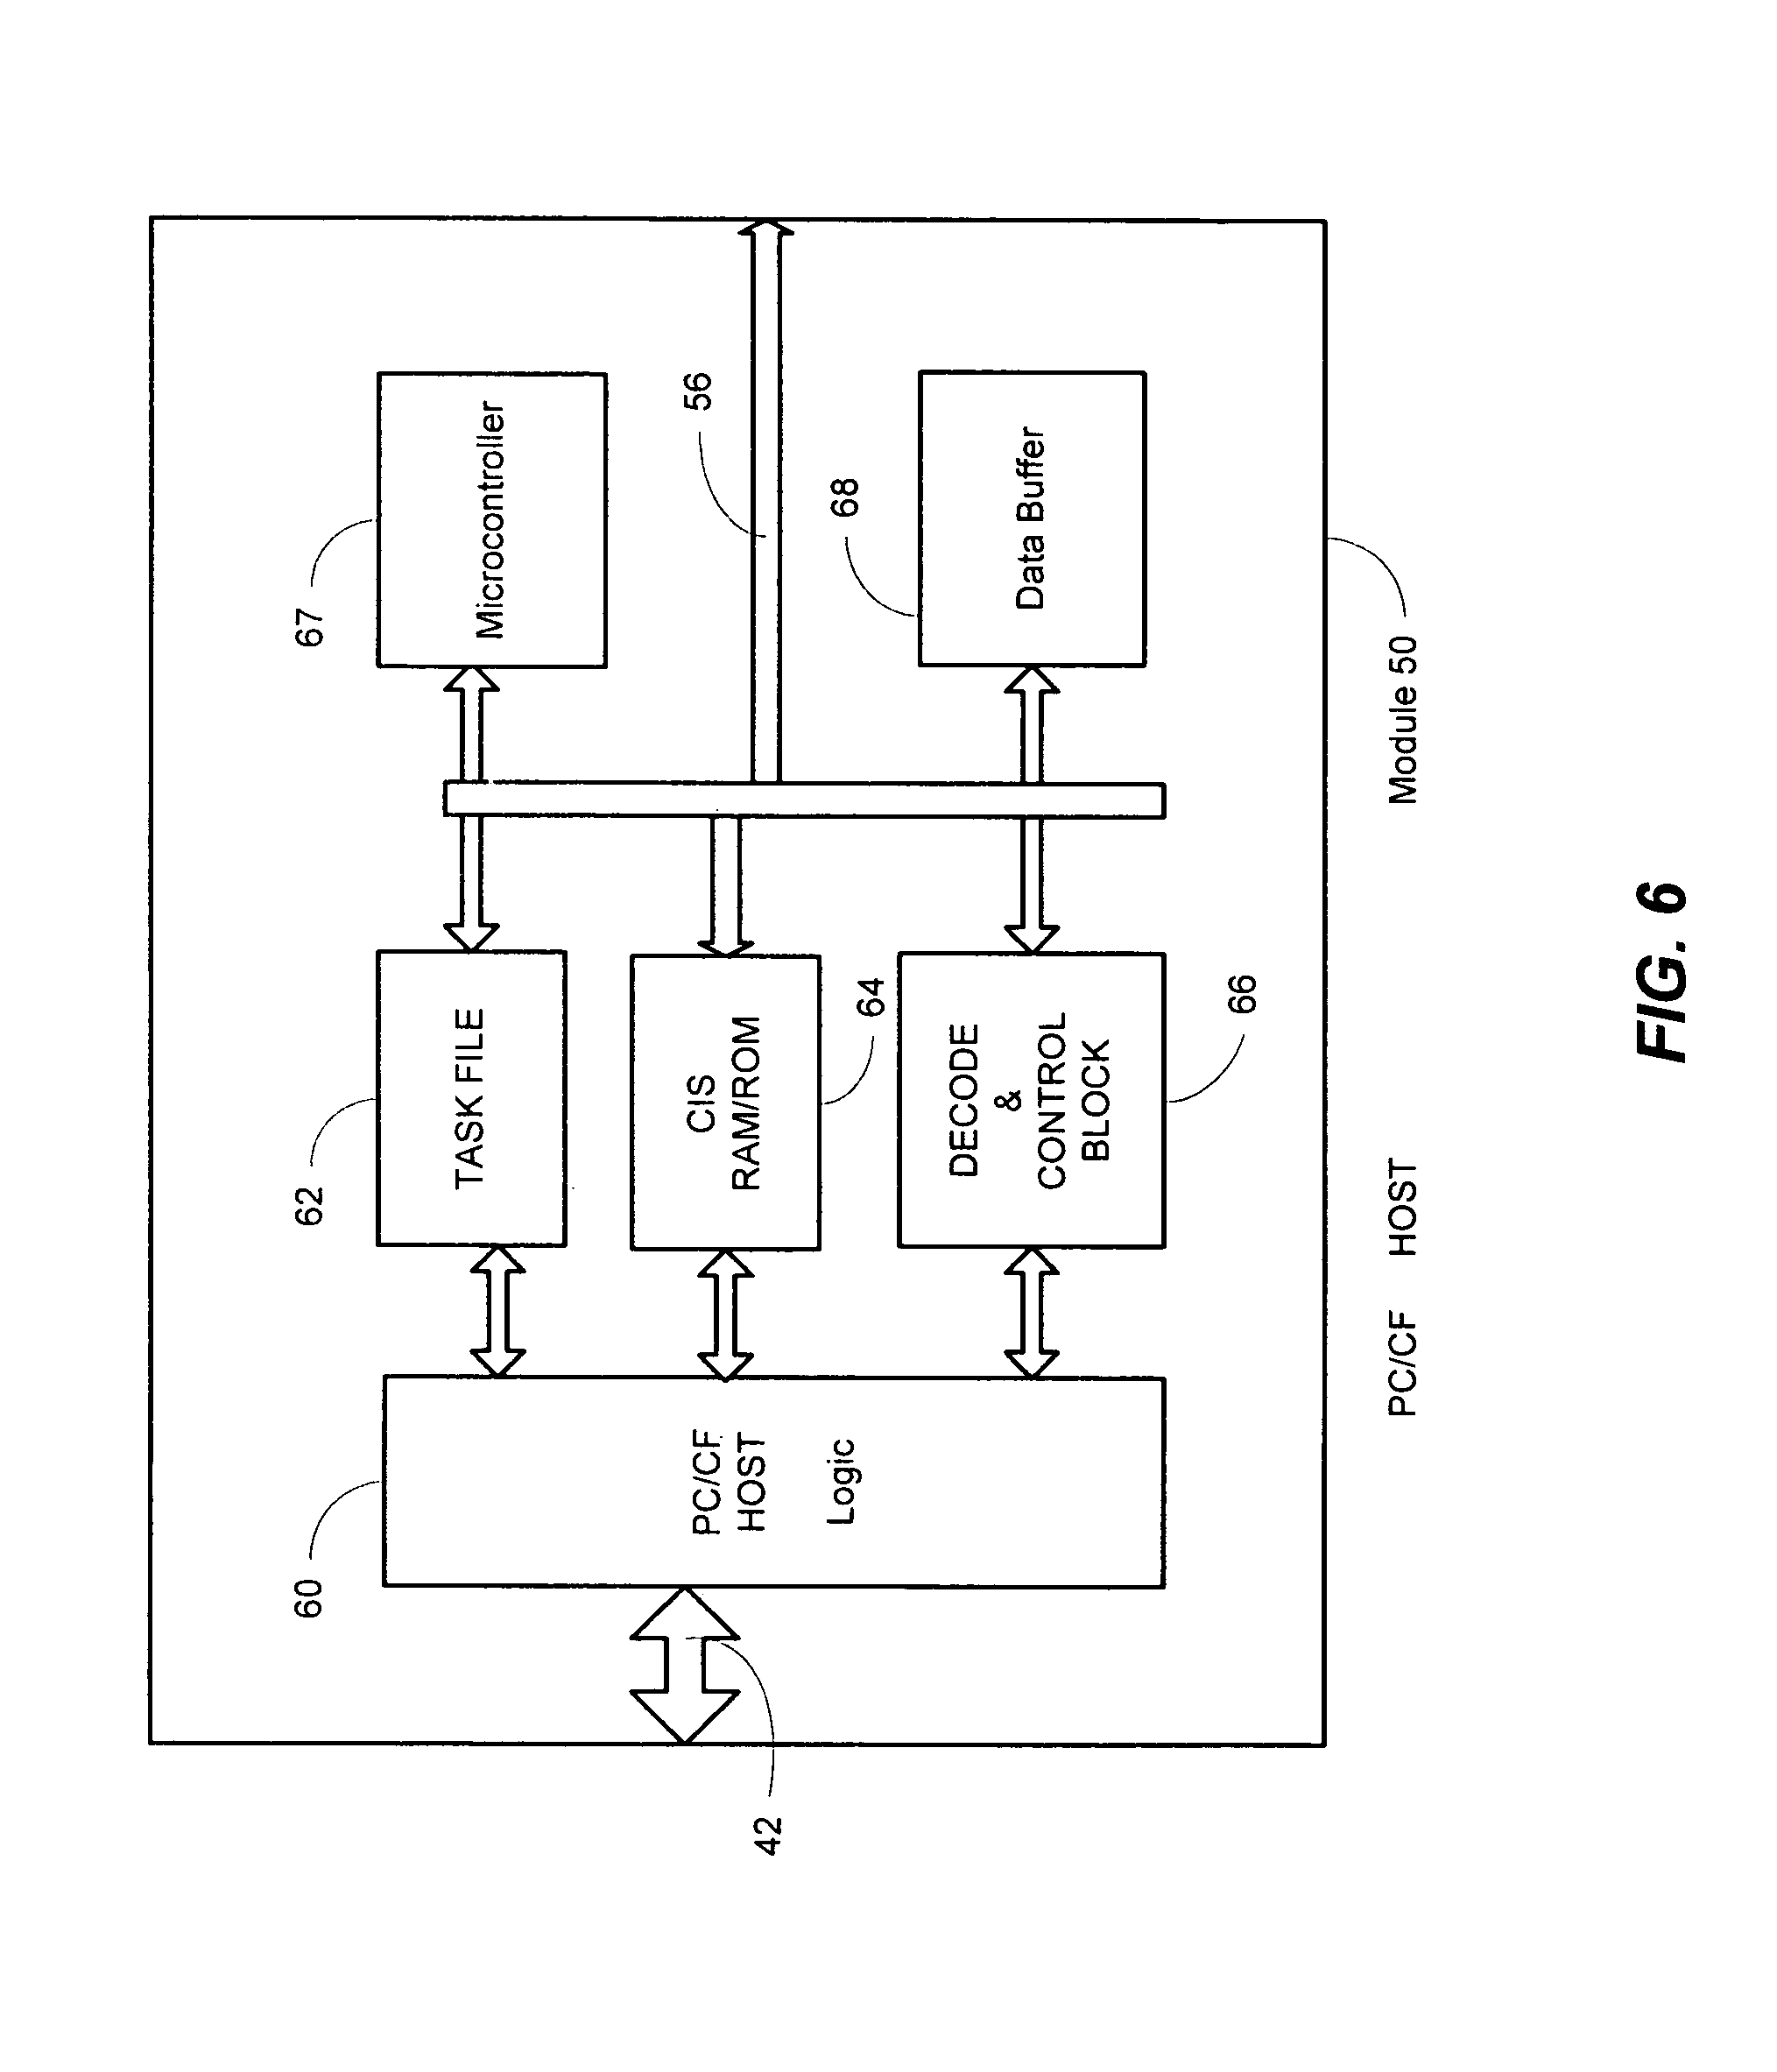 compact flash card block diagram   32 wiring diagram